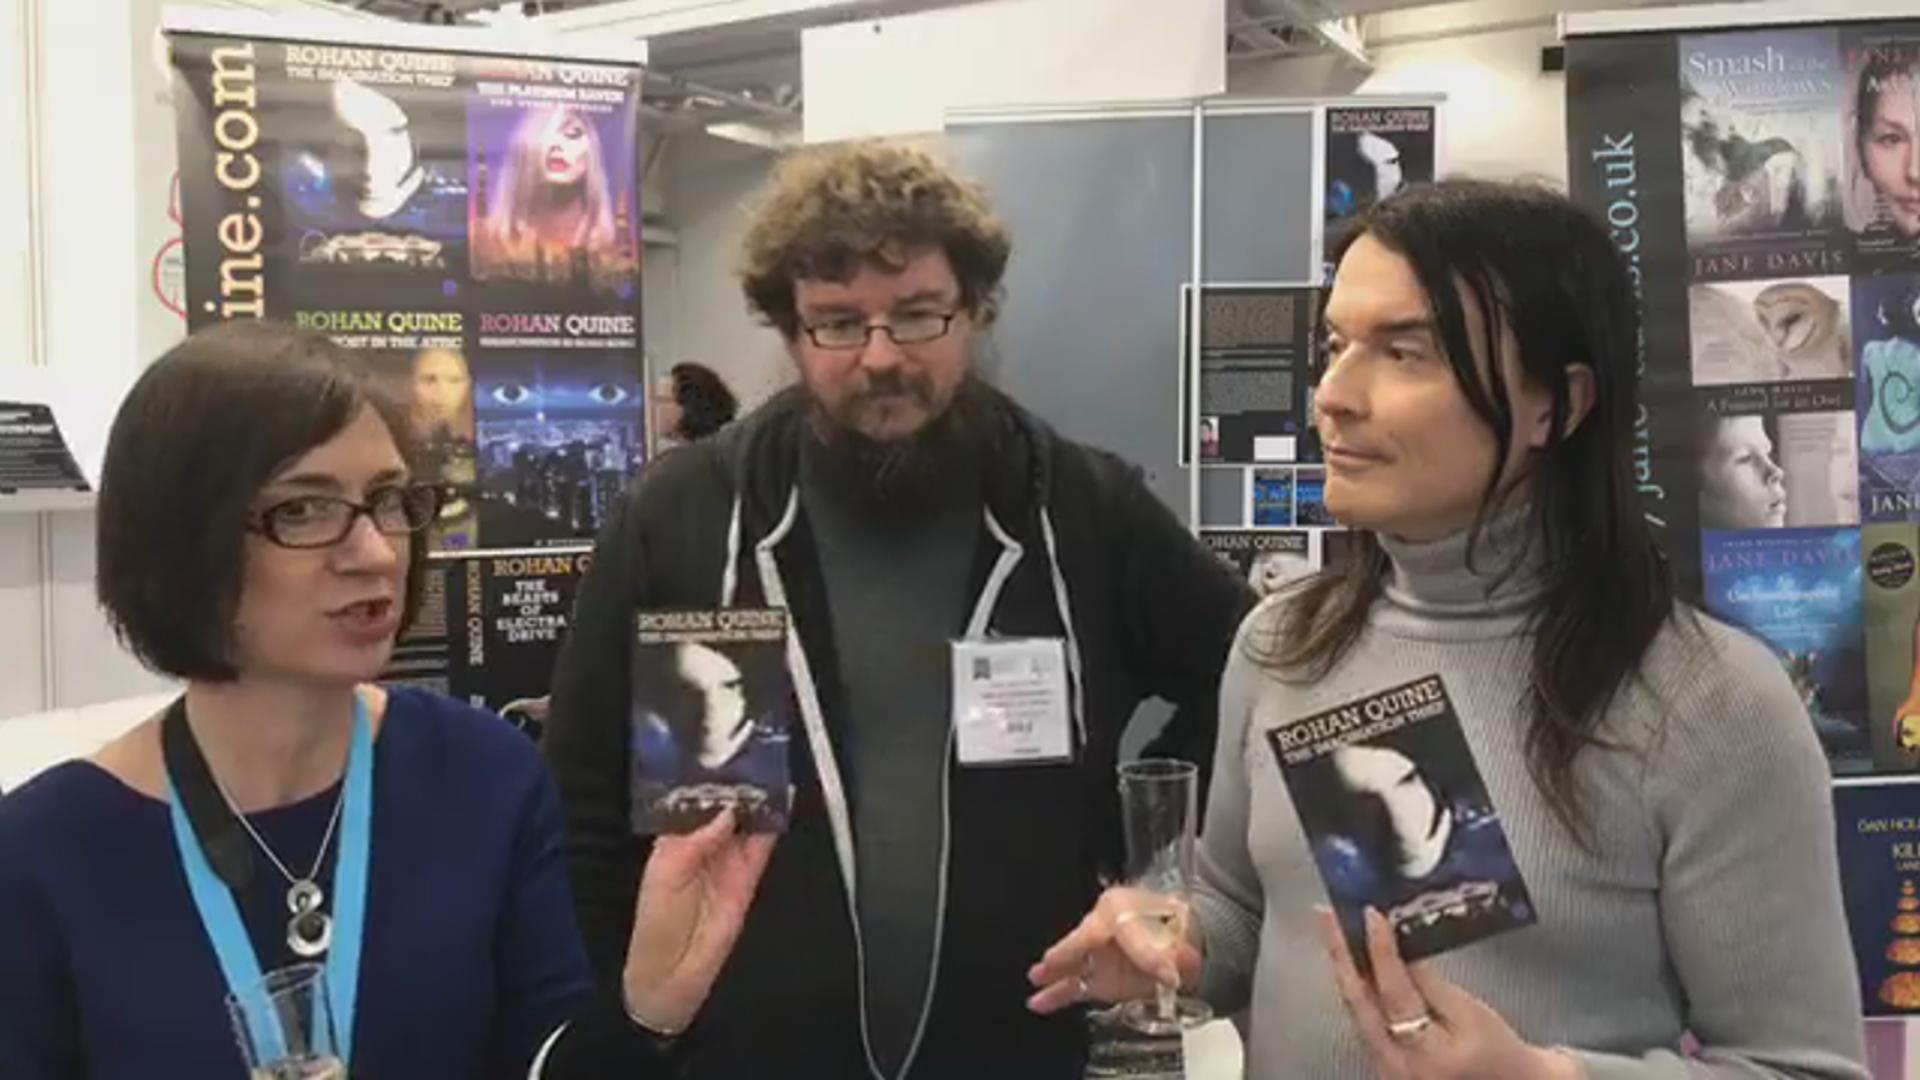 LBF18 launch of Rohan Quine's 'The Beasts of Electra Drive', Dan Holloway's 'Kill Land' & Jane Davis's 'Smash all the Windows' - 5